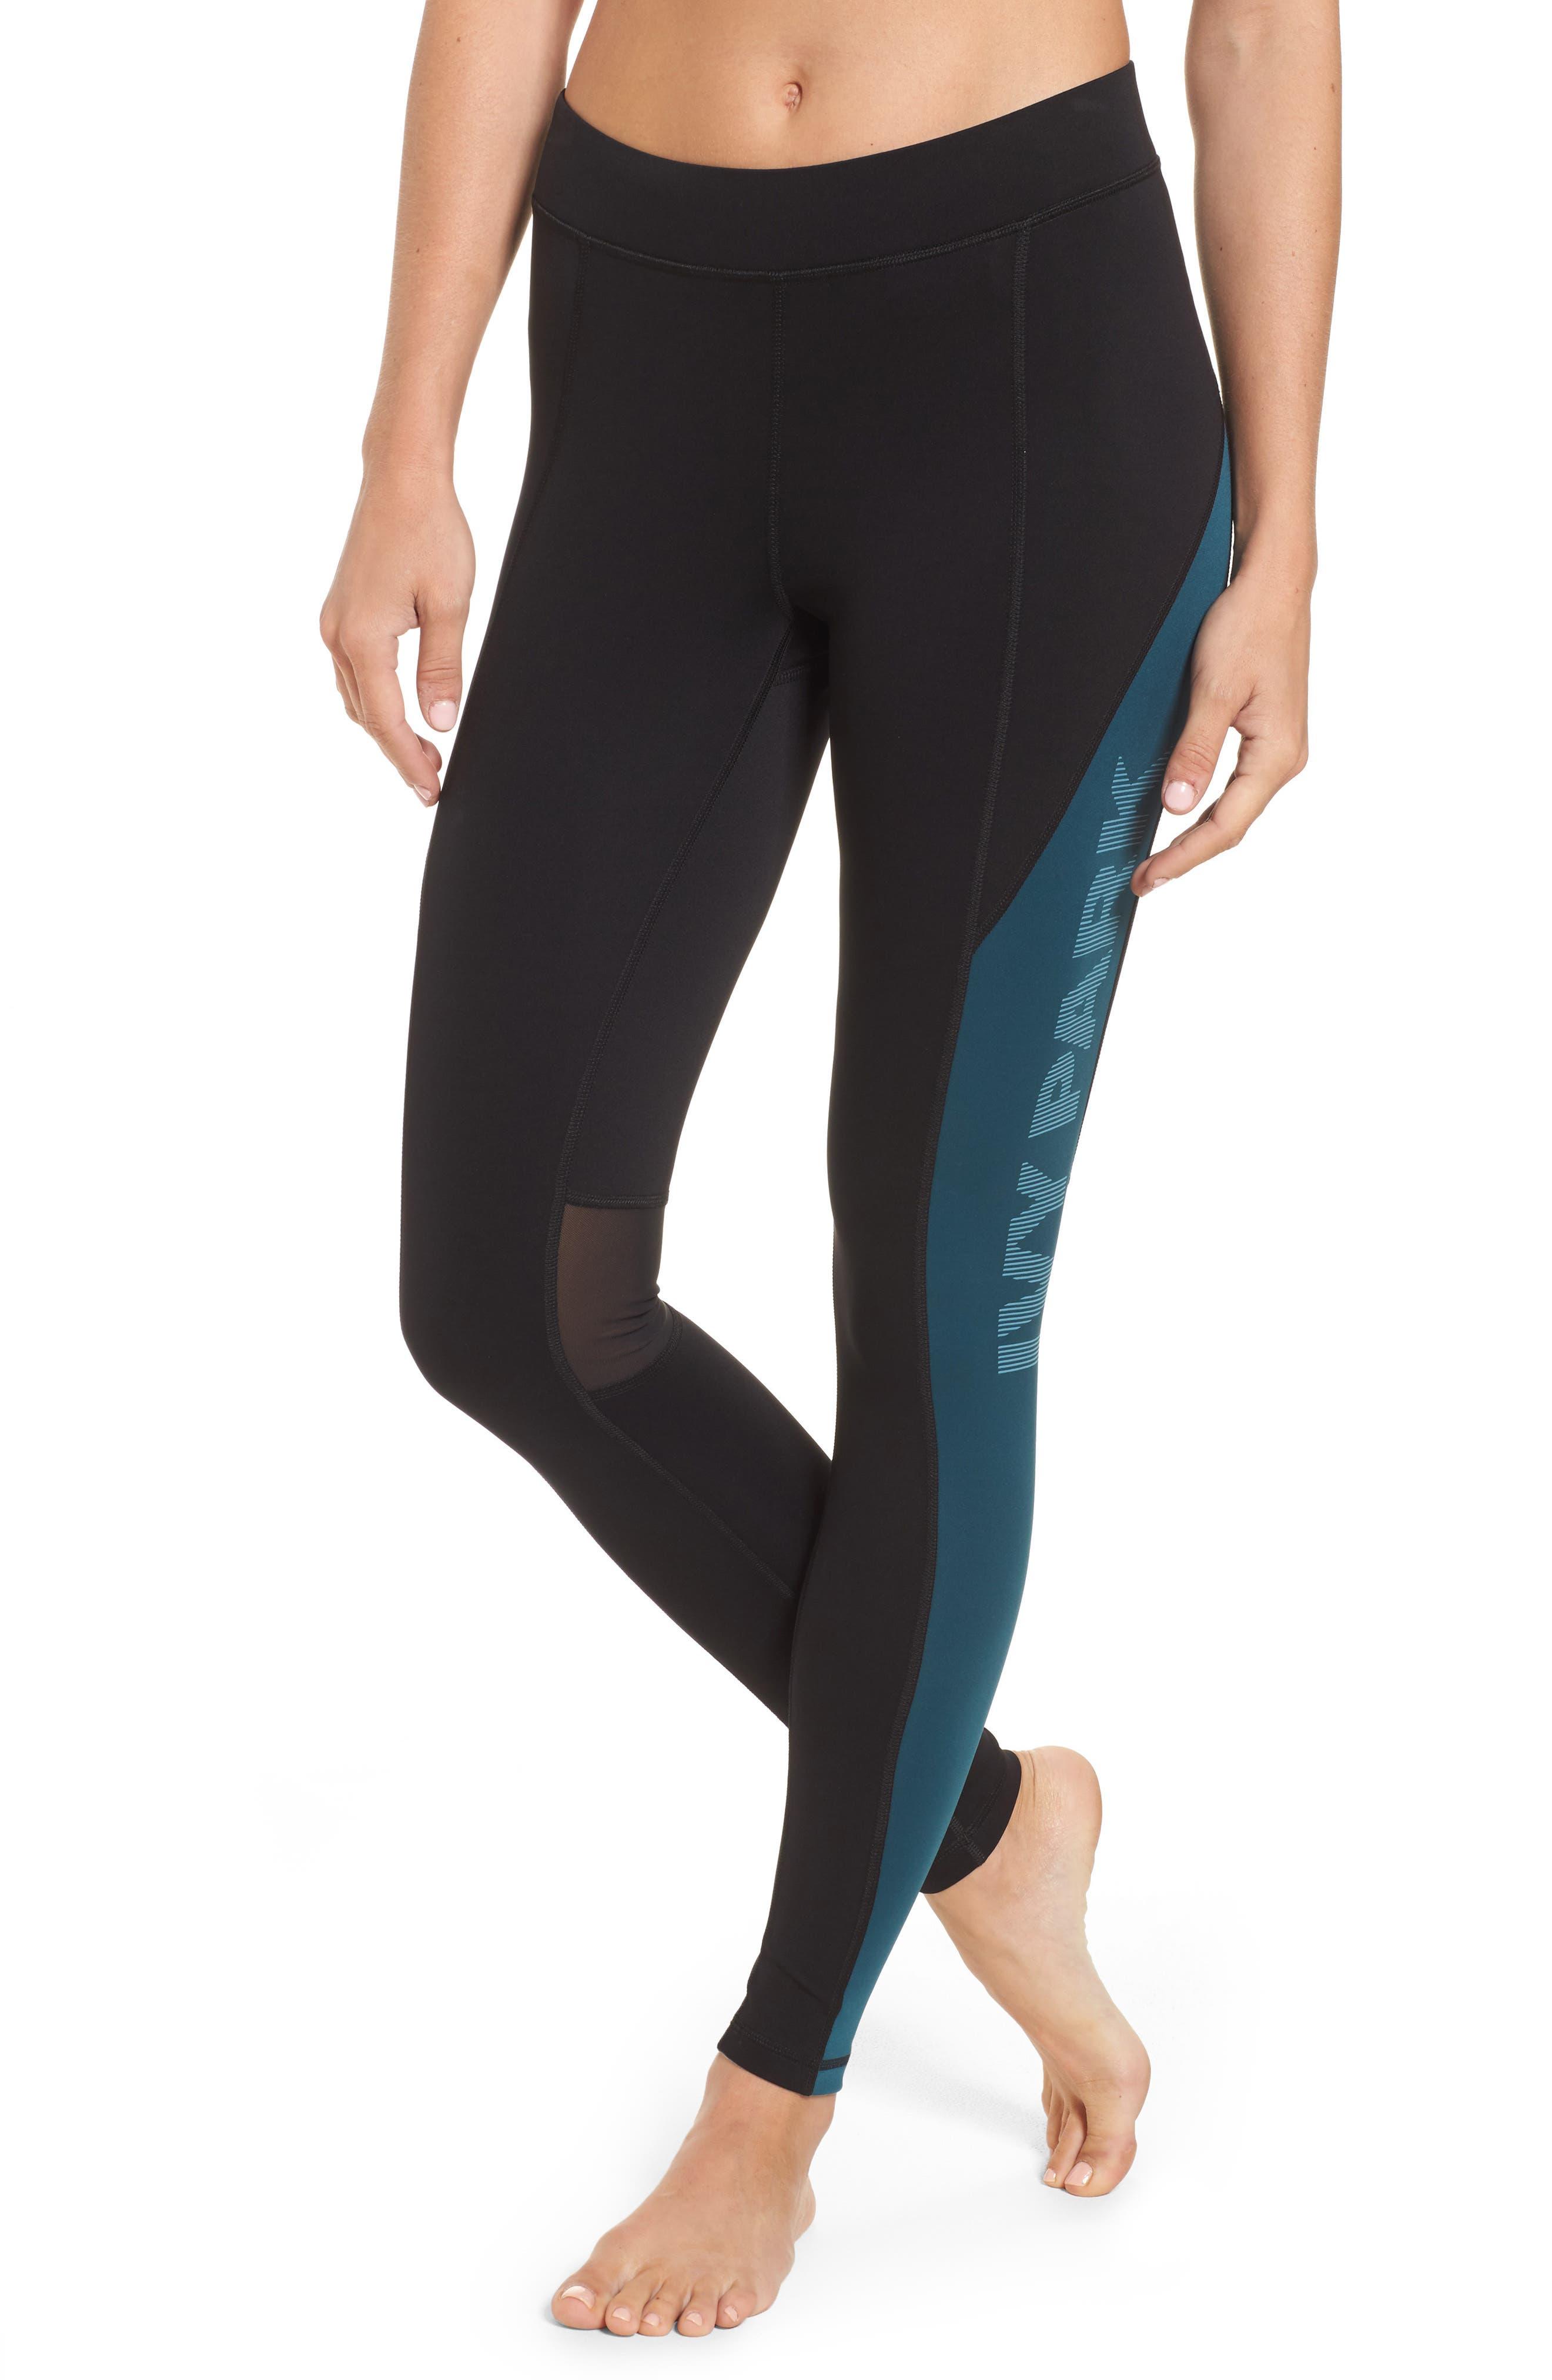 Alternate Image 1 Selected - IVY PARK® Logo Block Mid Rise Ankle Leggings